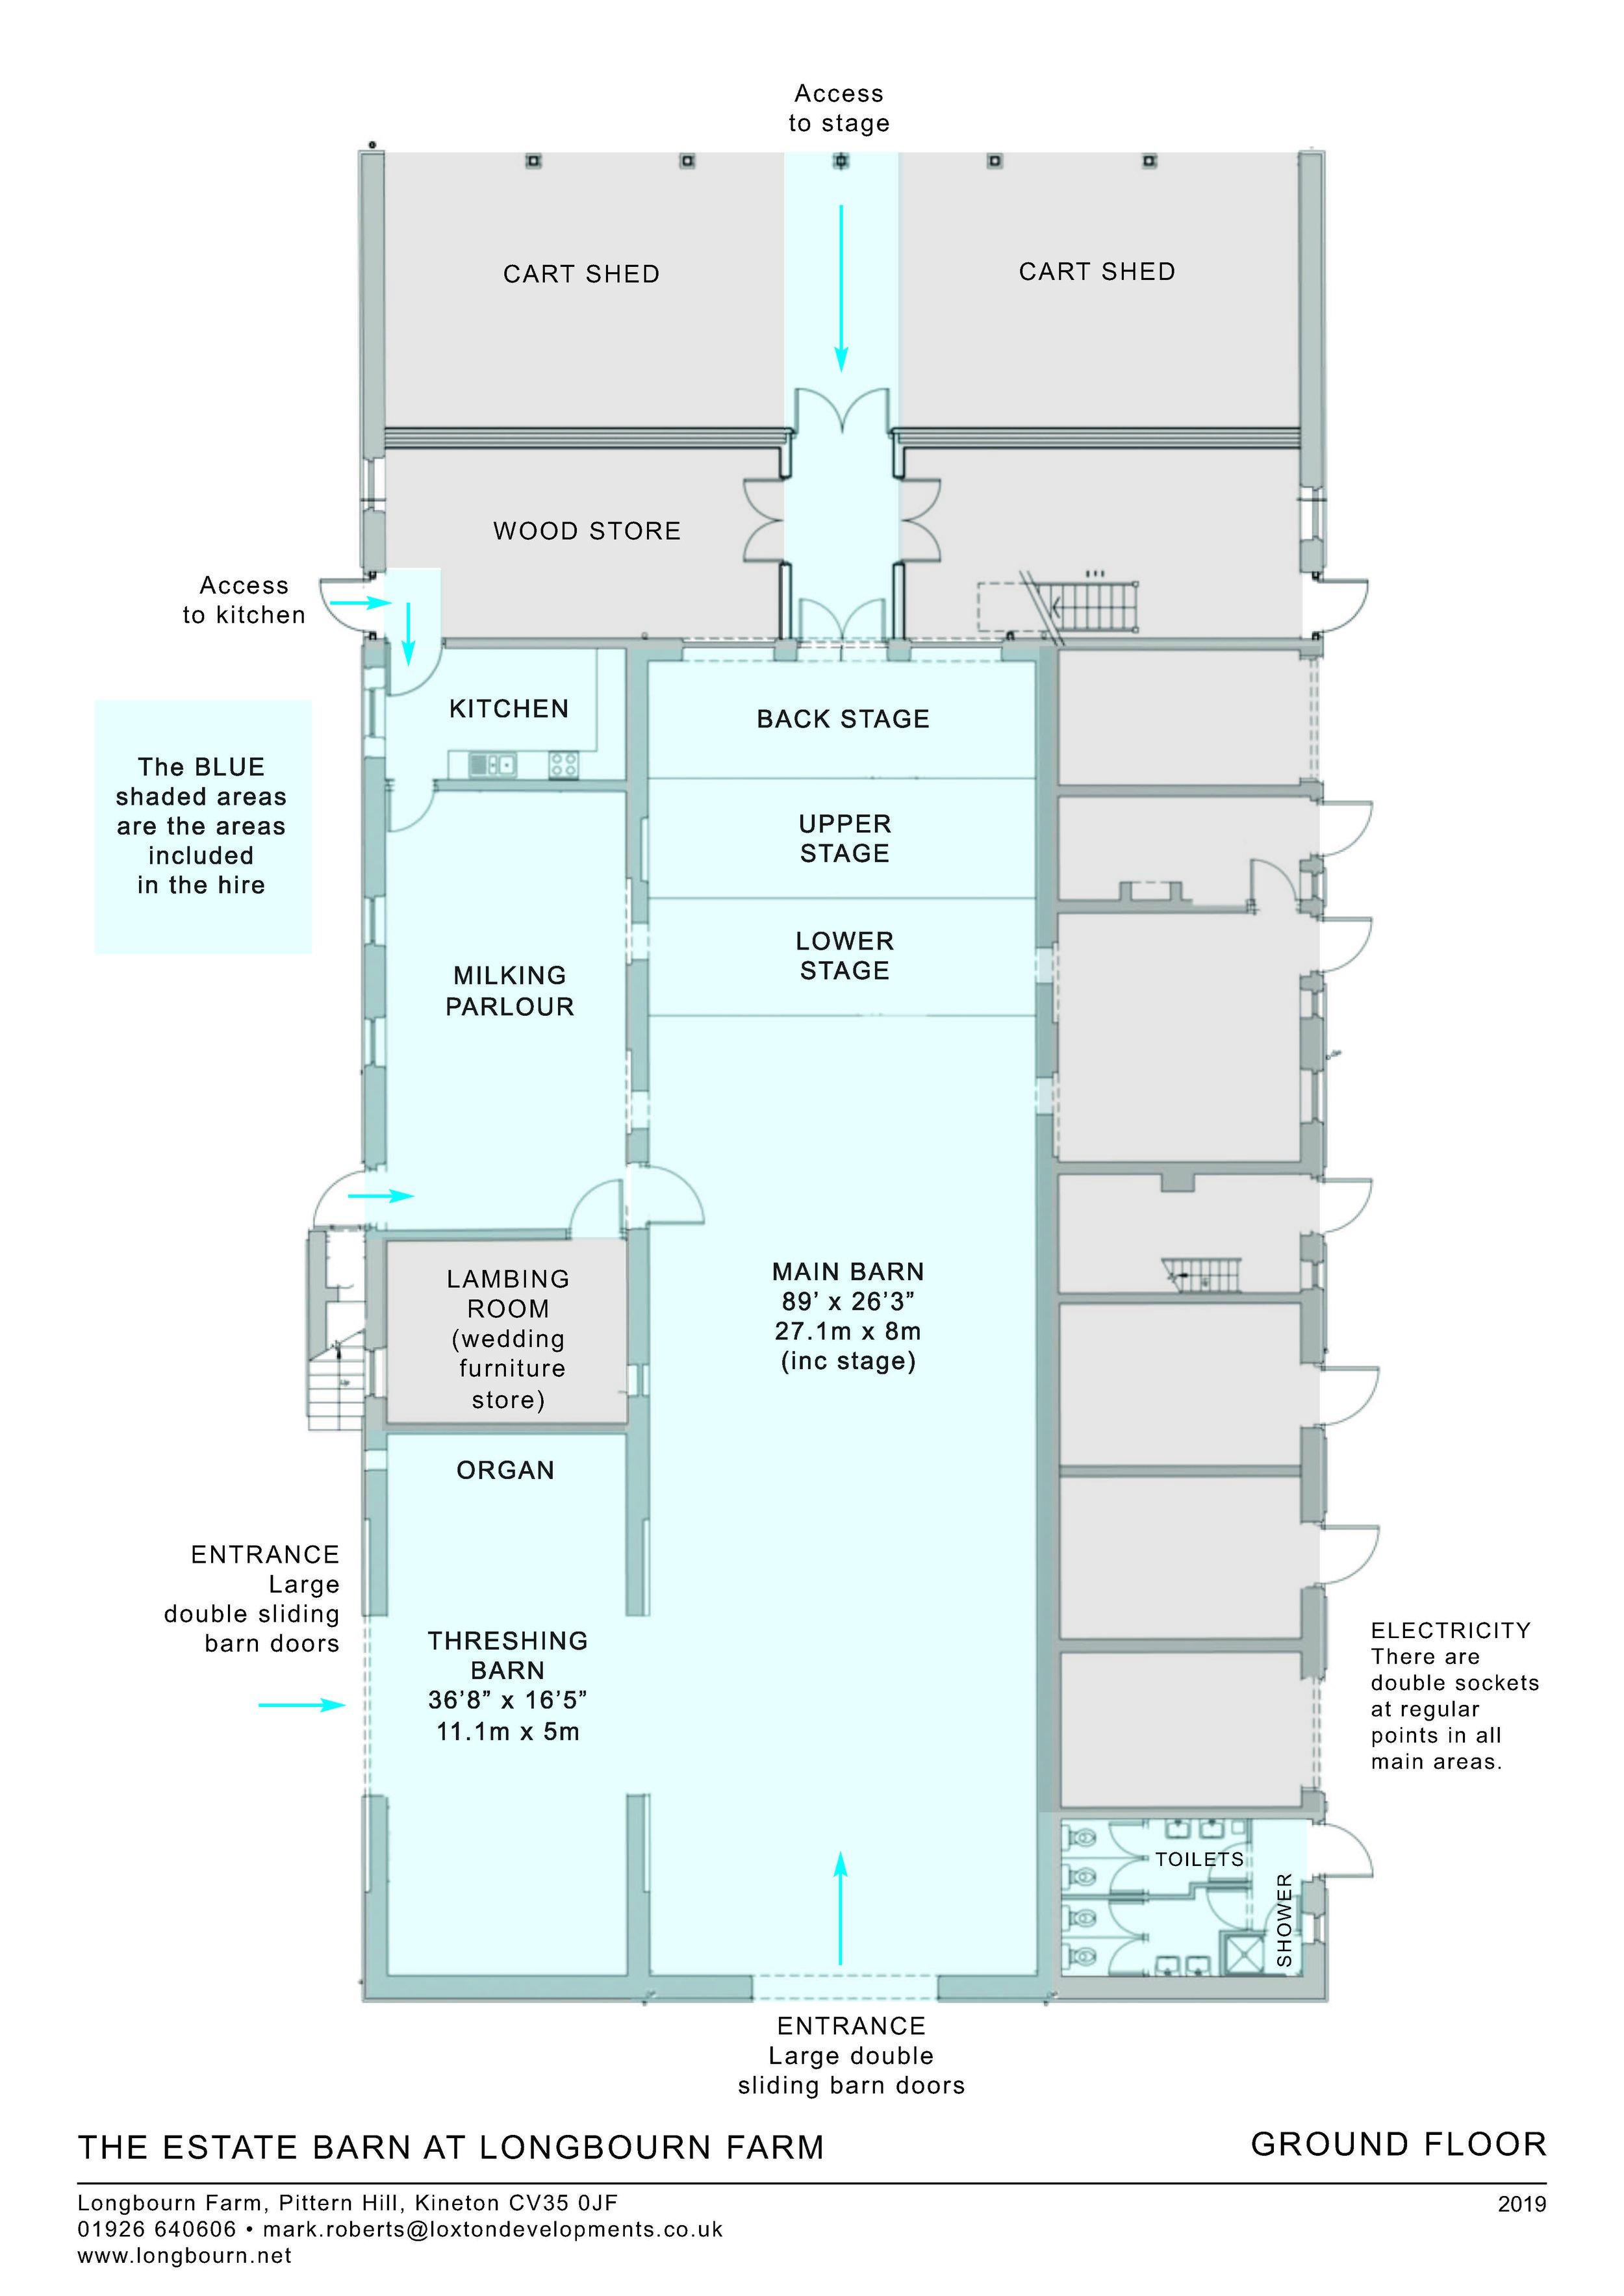 Wedding barn plans (Page 01).jpg